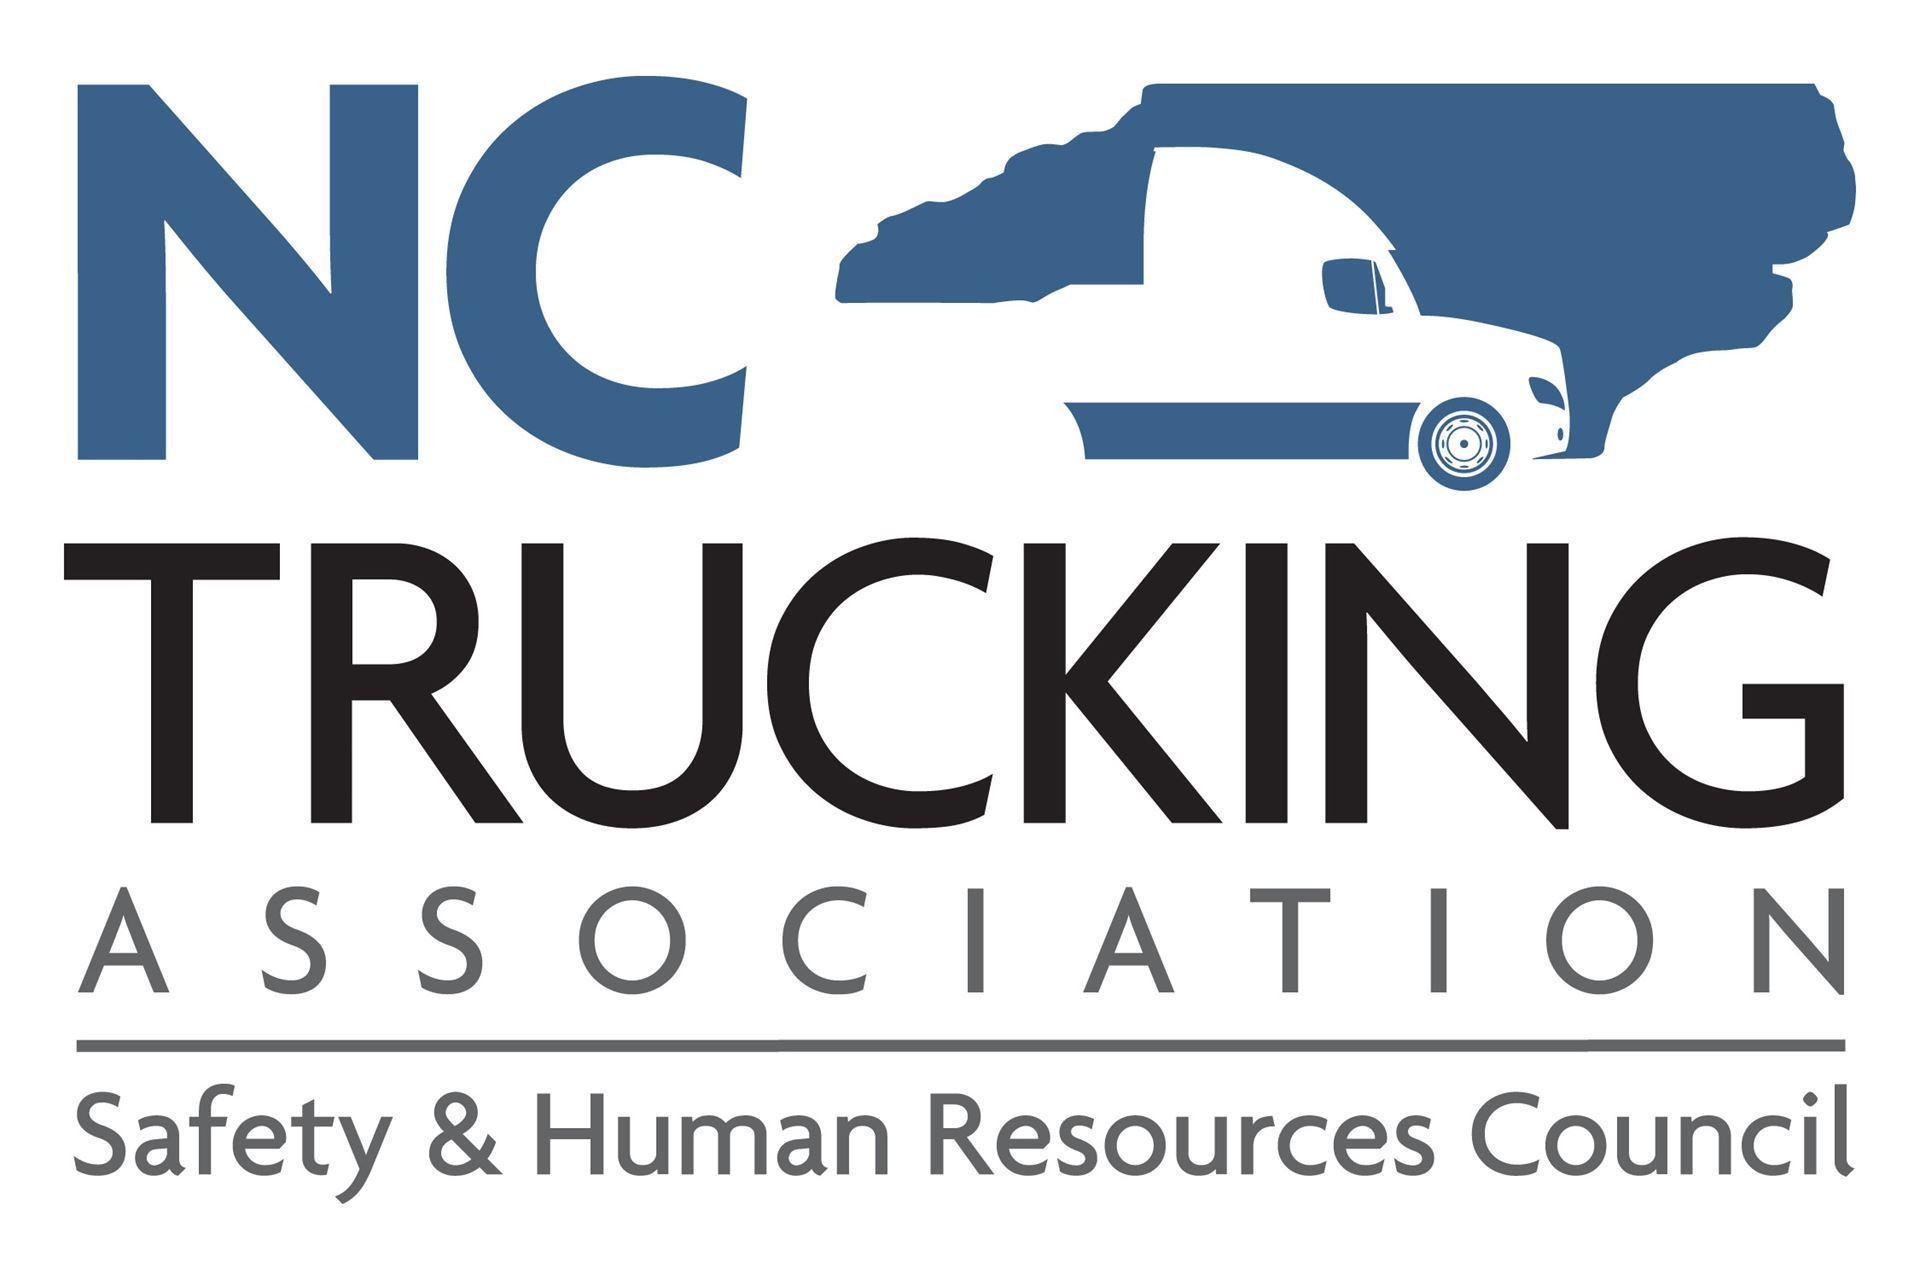 SHRC Meeting: 4/9/20 FMCSA Updates